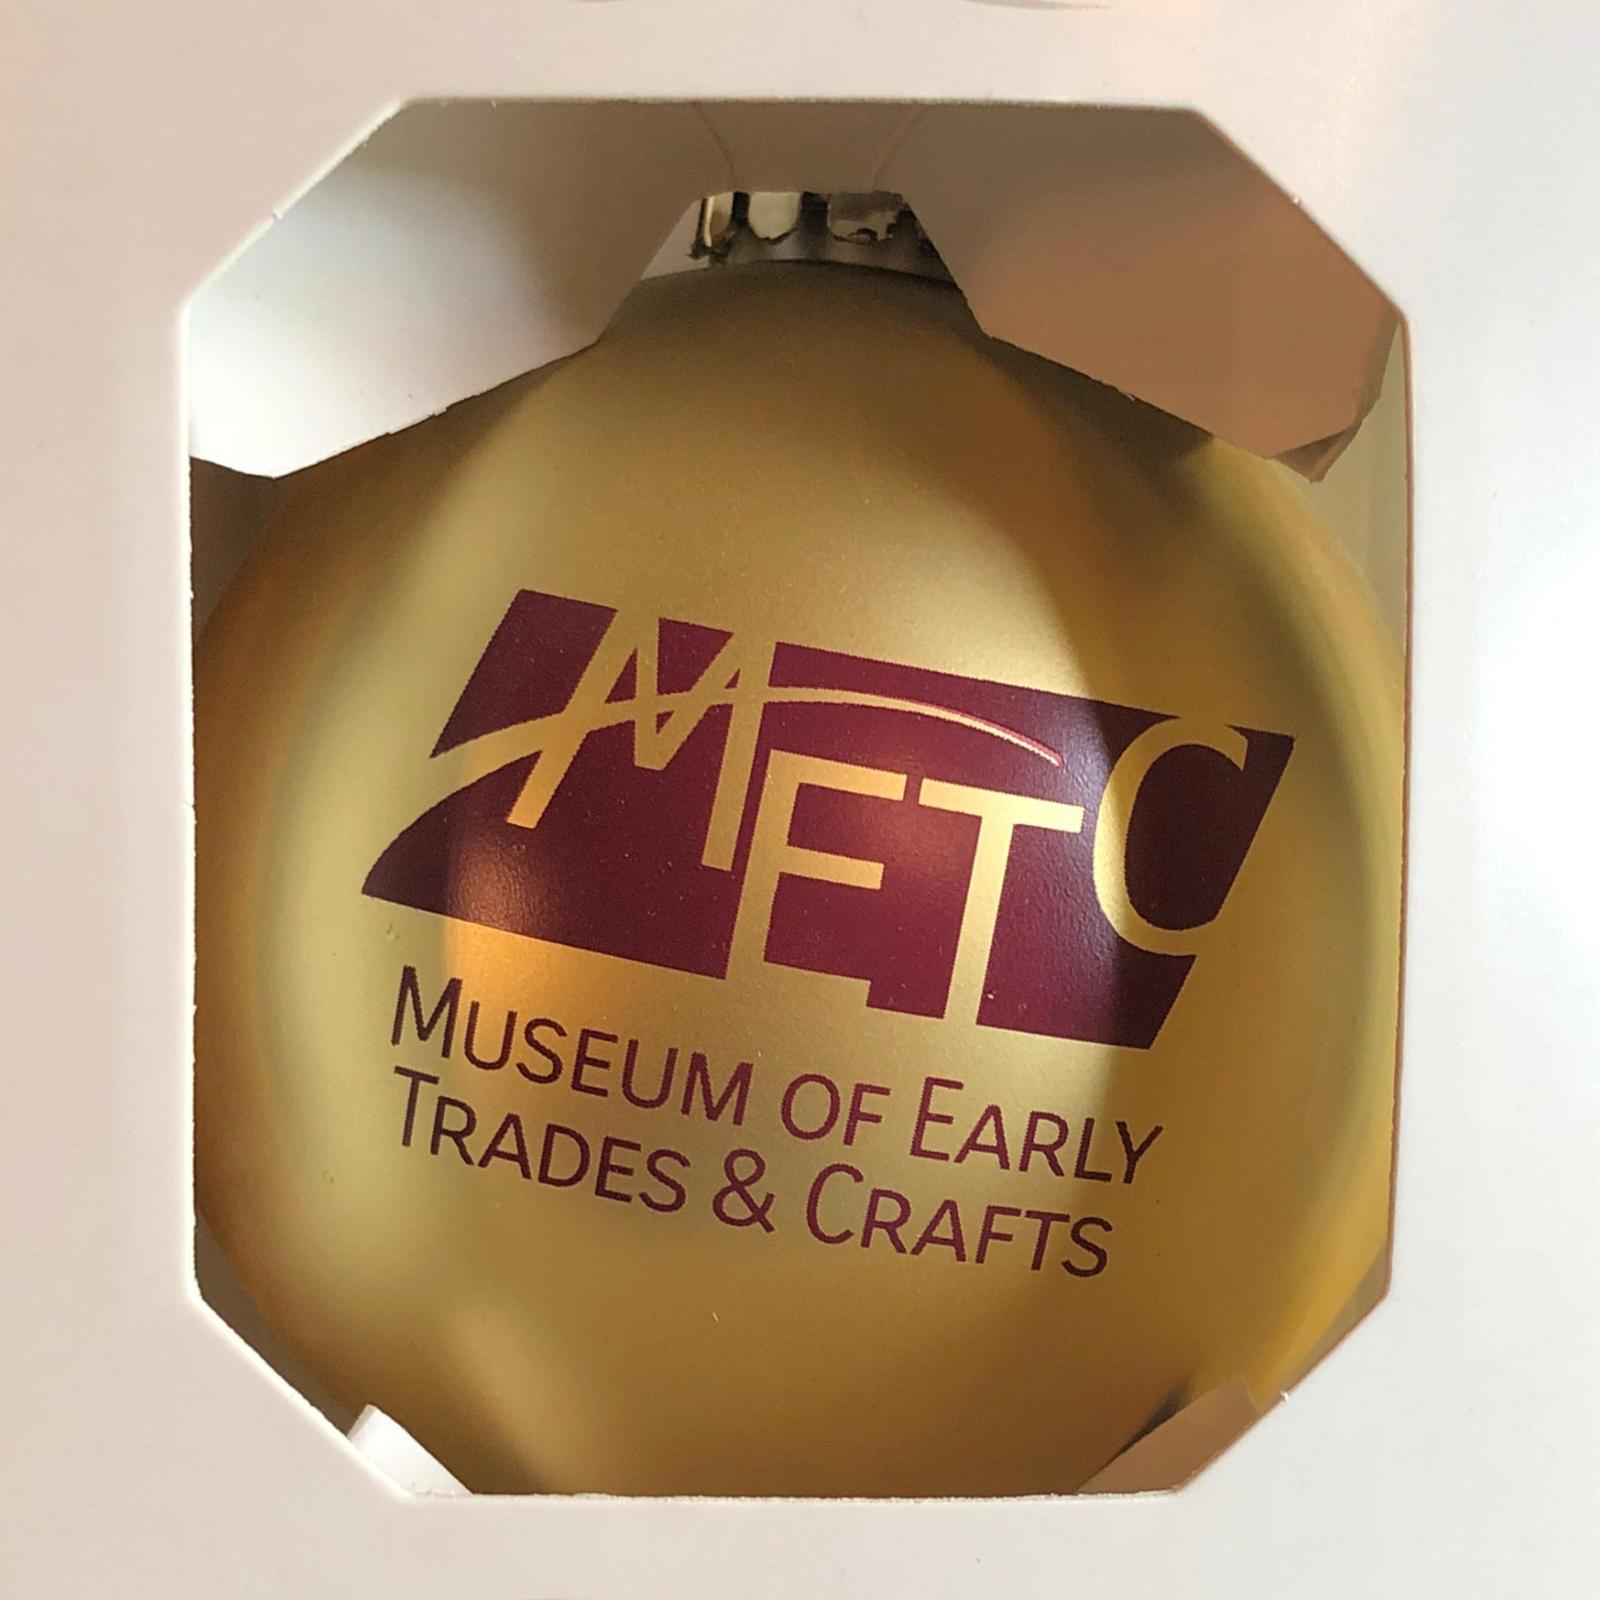 METC Ornament